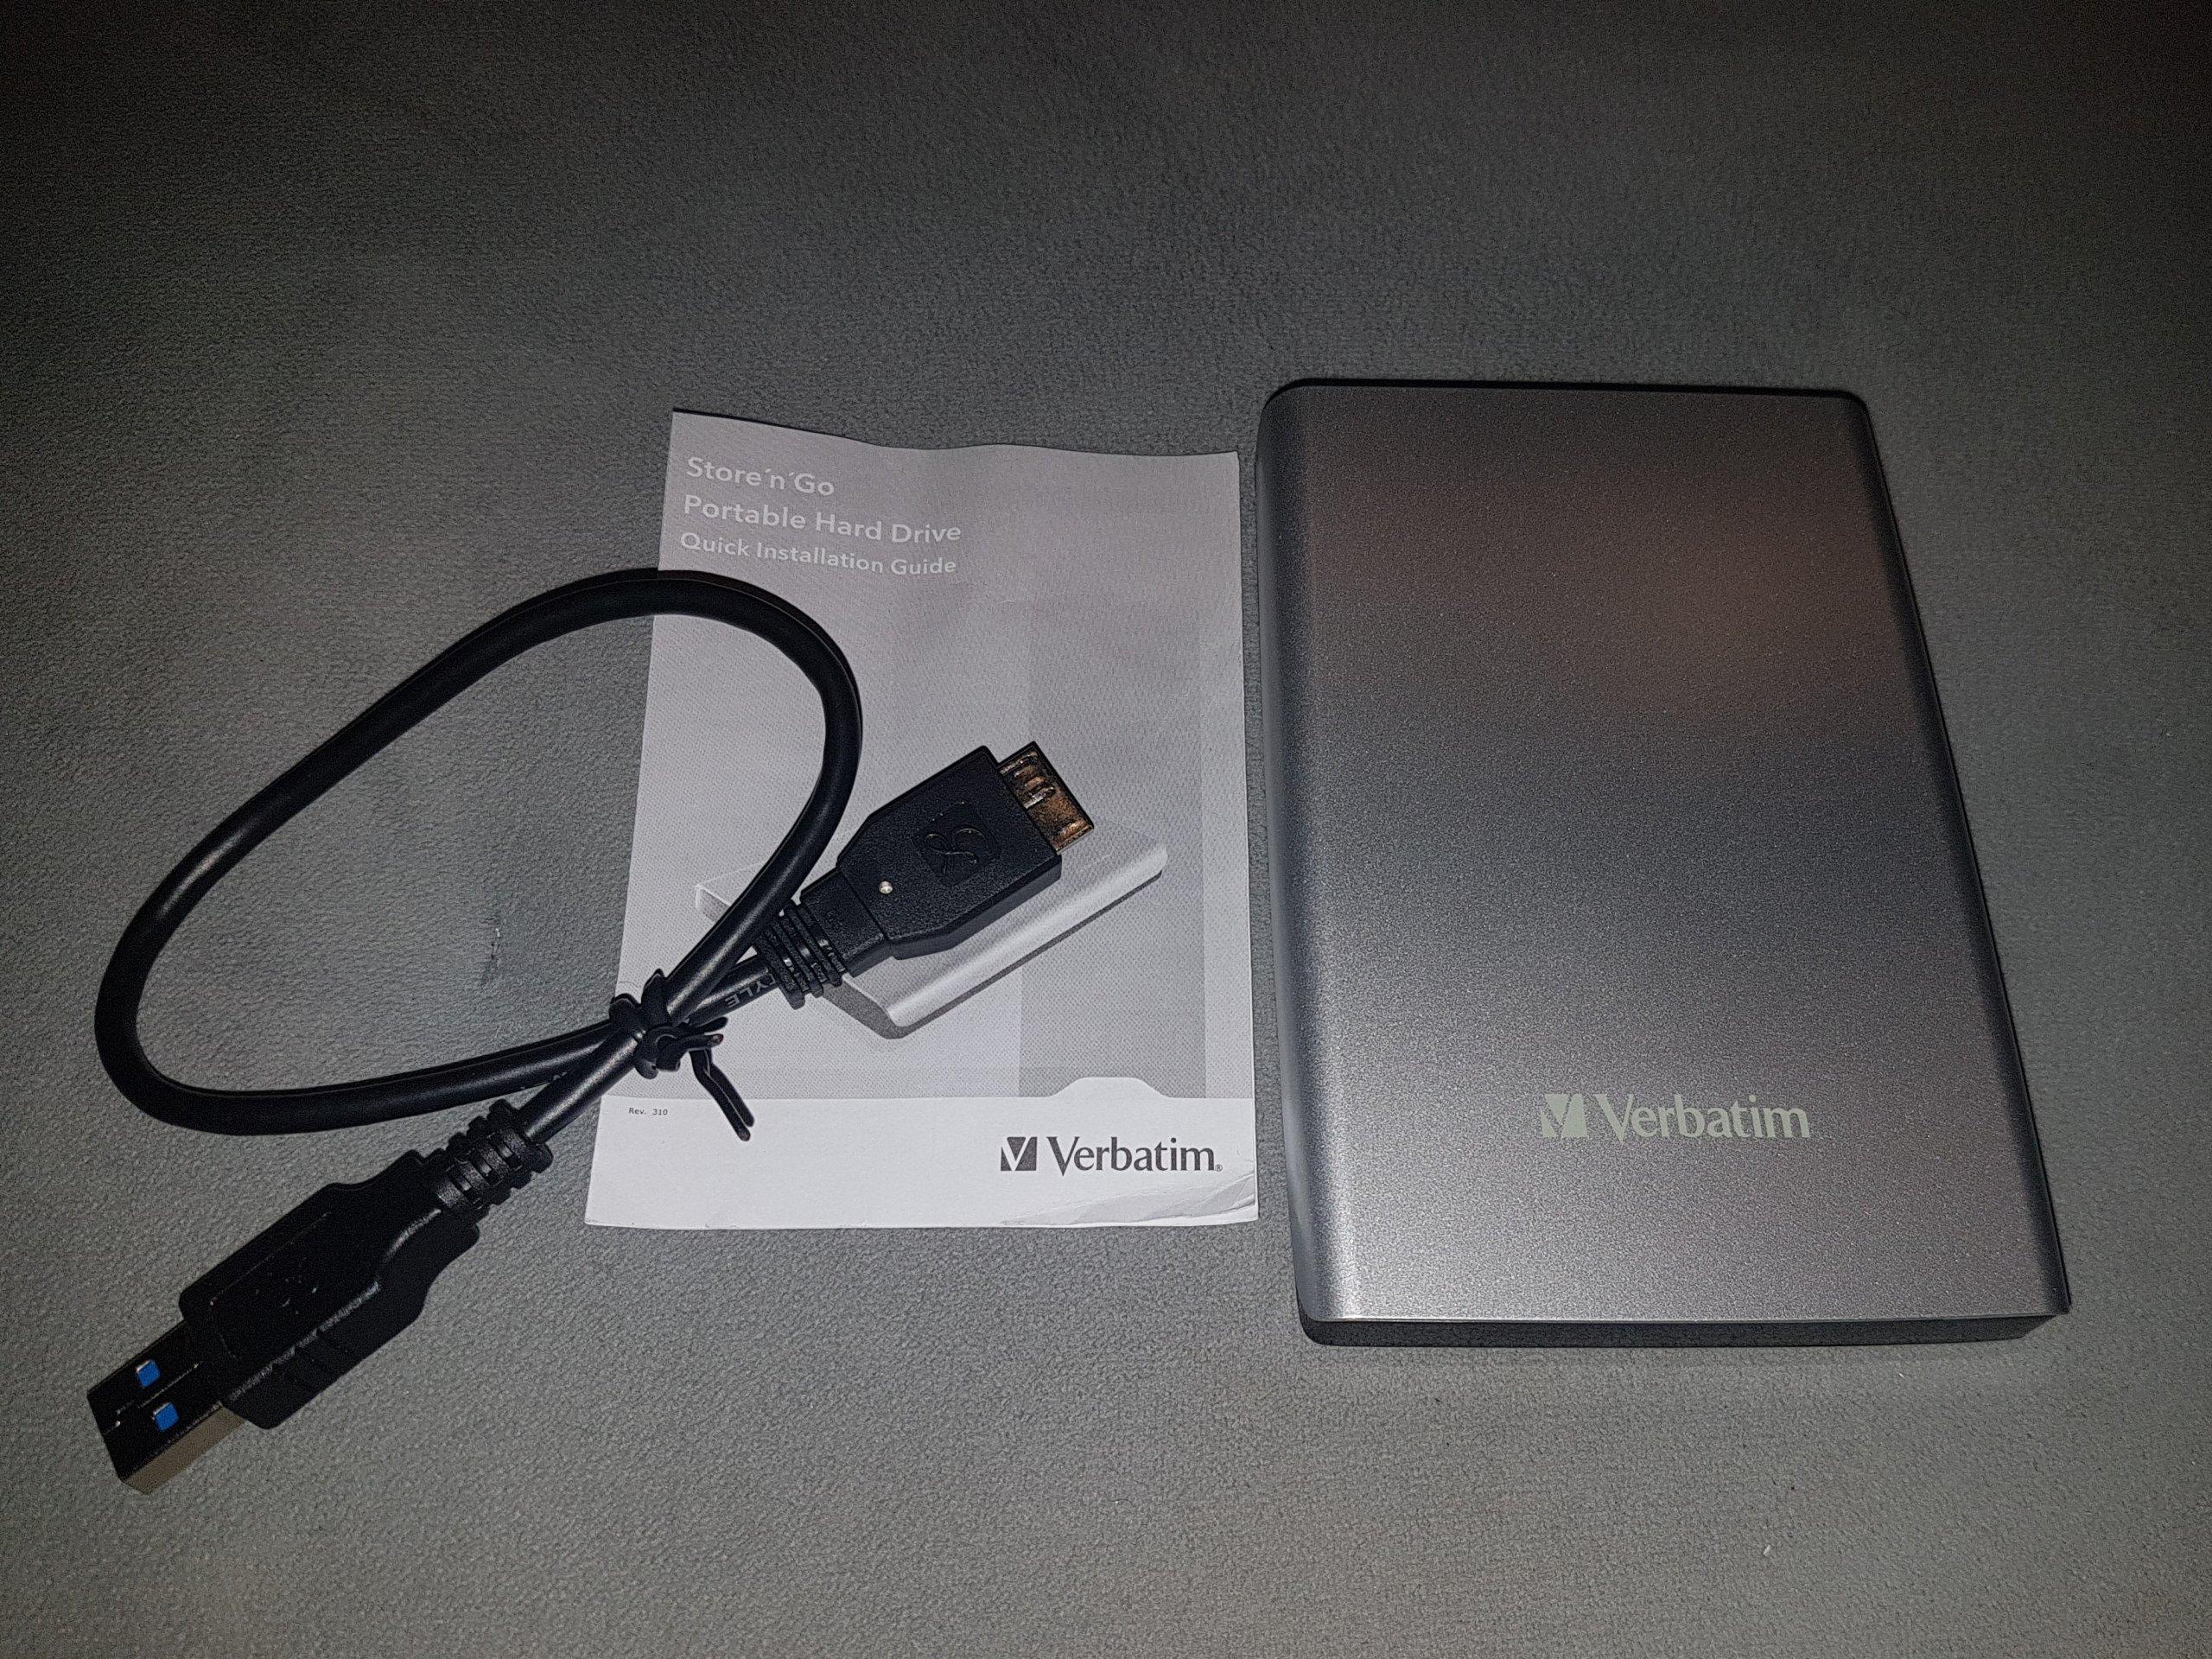 Dysk Zewnetrzny VERBATIM 1TB . Srebrny Nowy,USB3.0